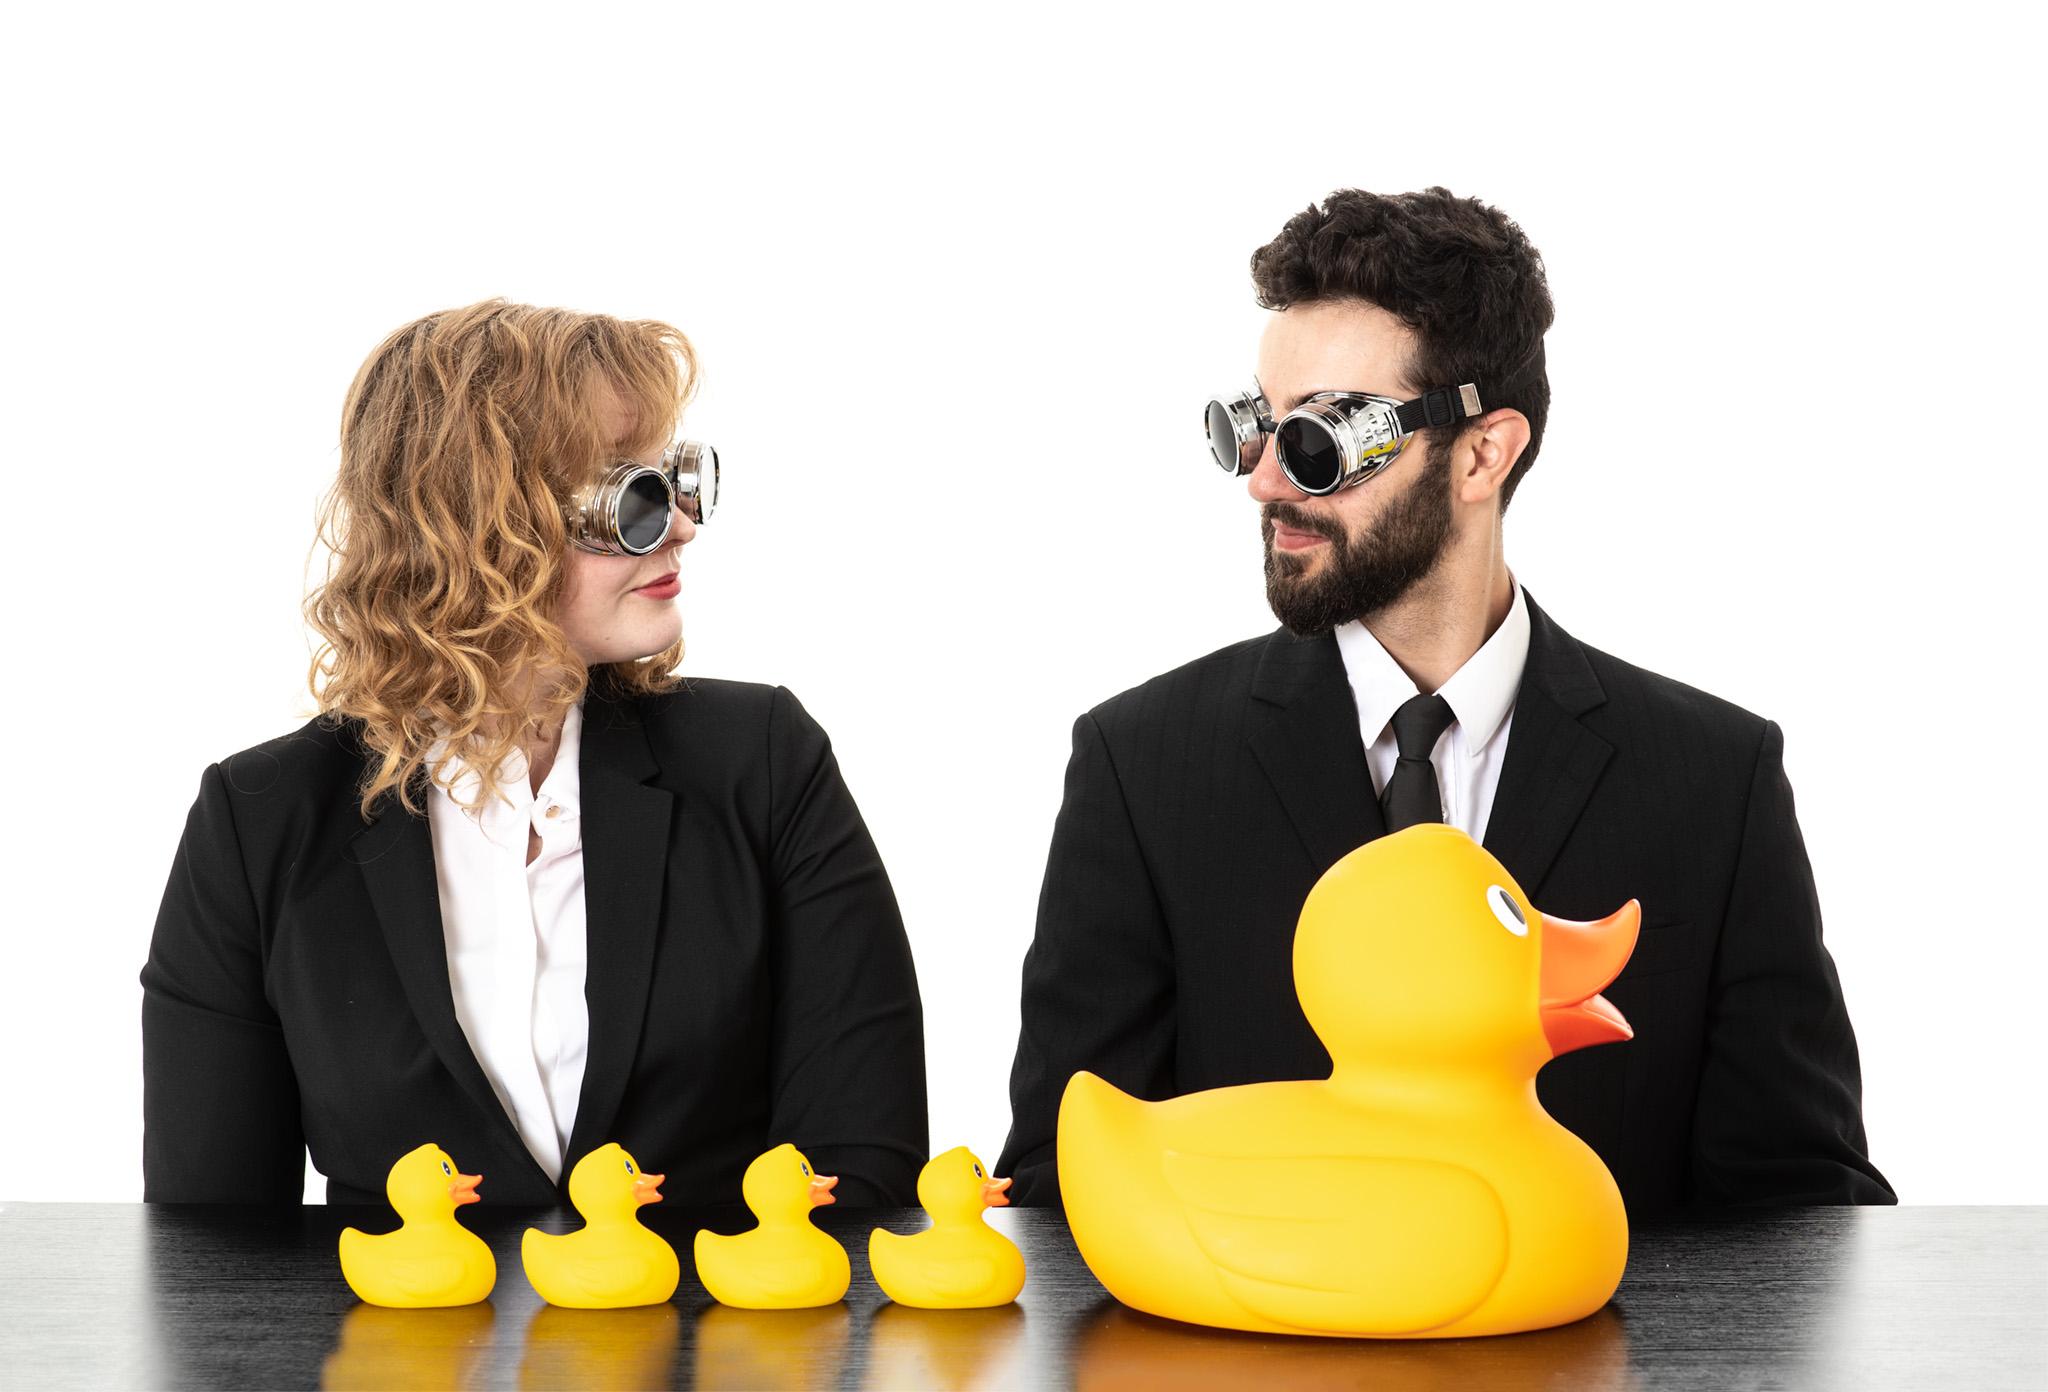 BG 30 April00722 Ducks in a row 2048.jpg